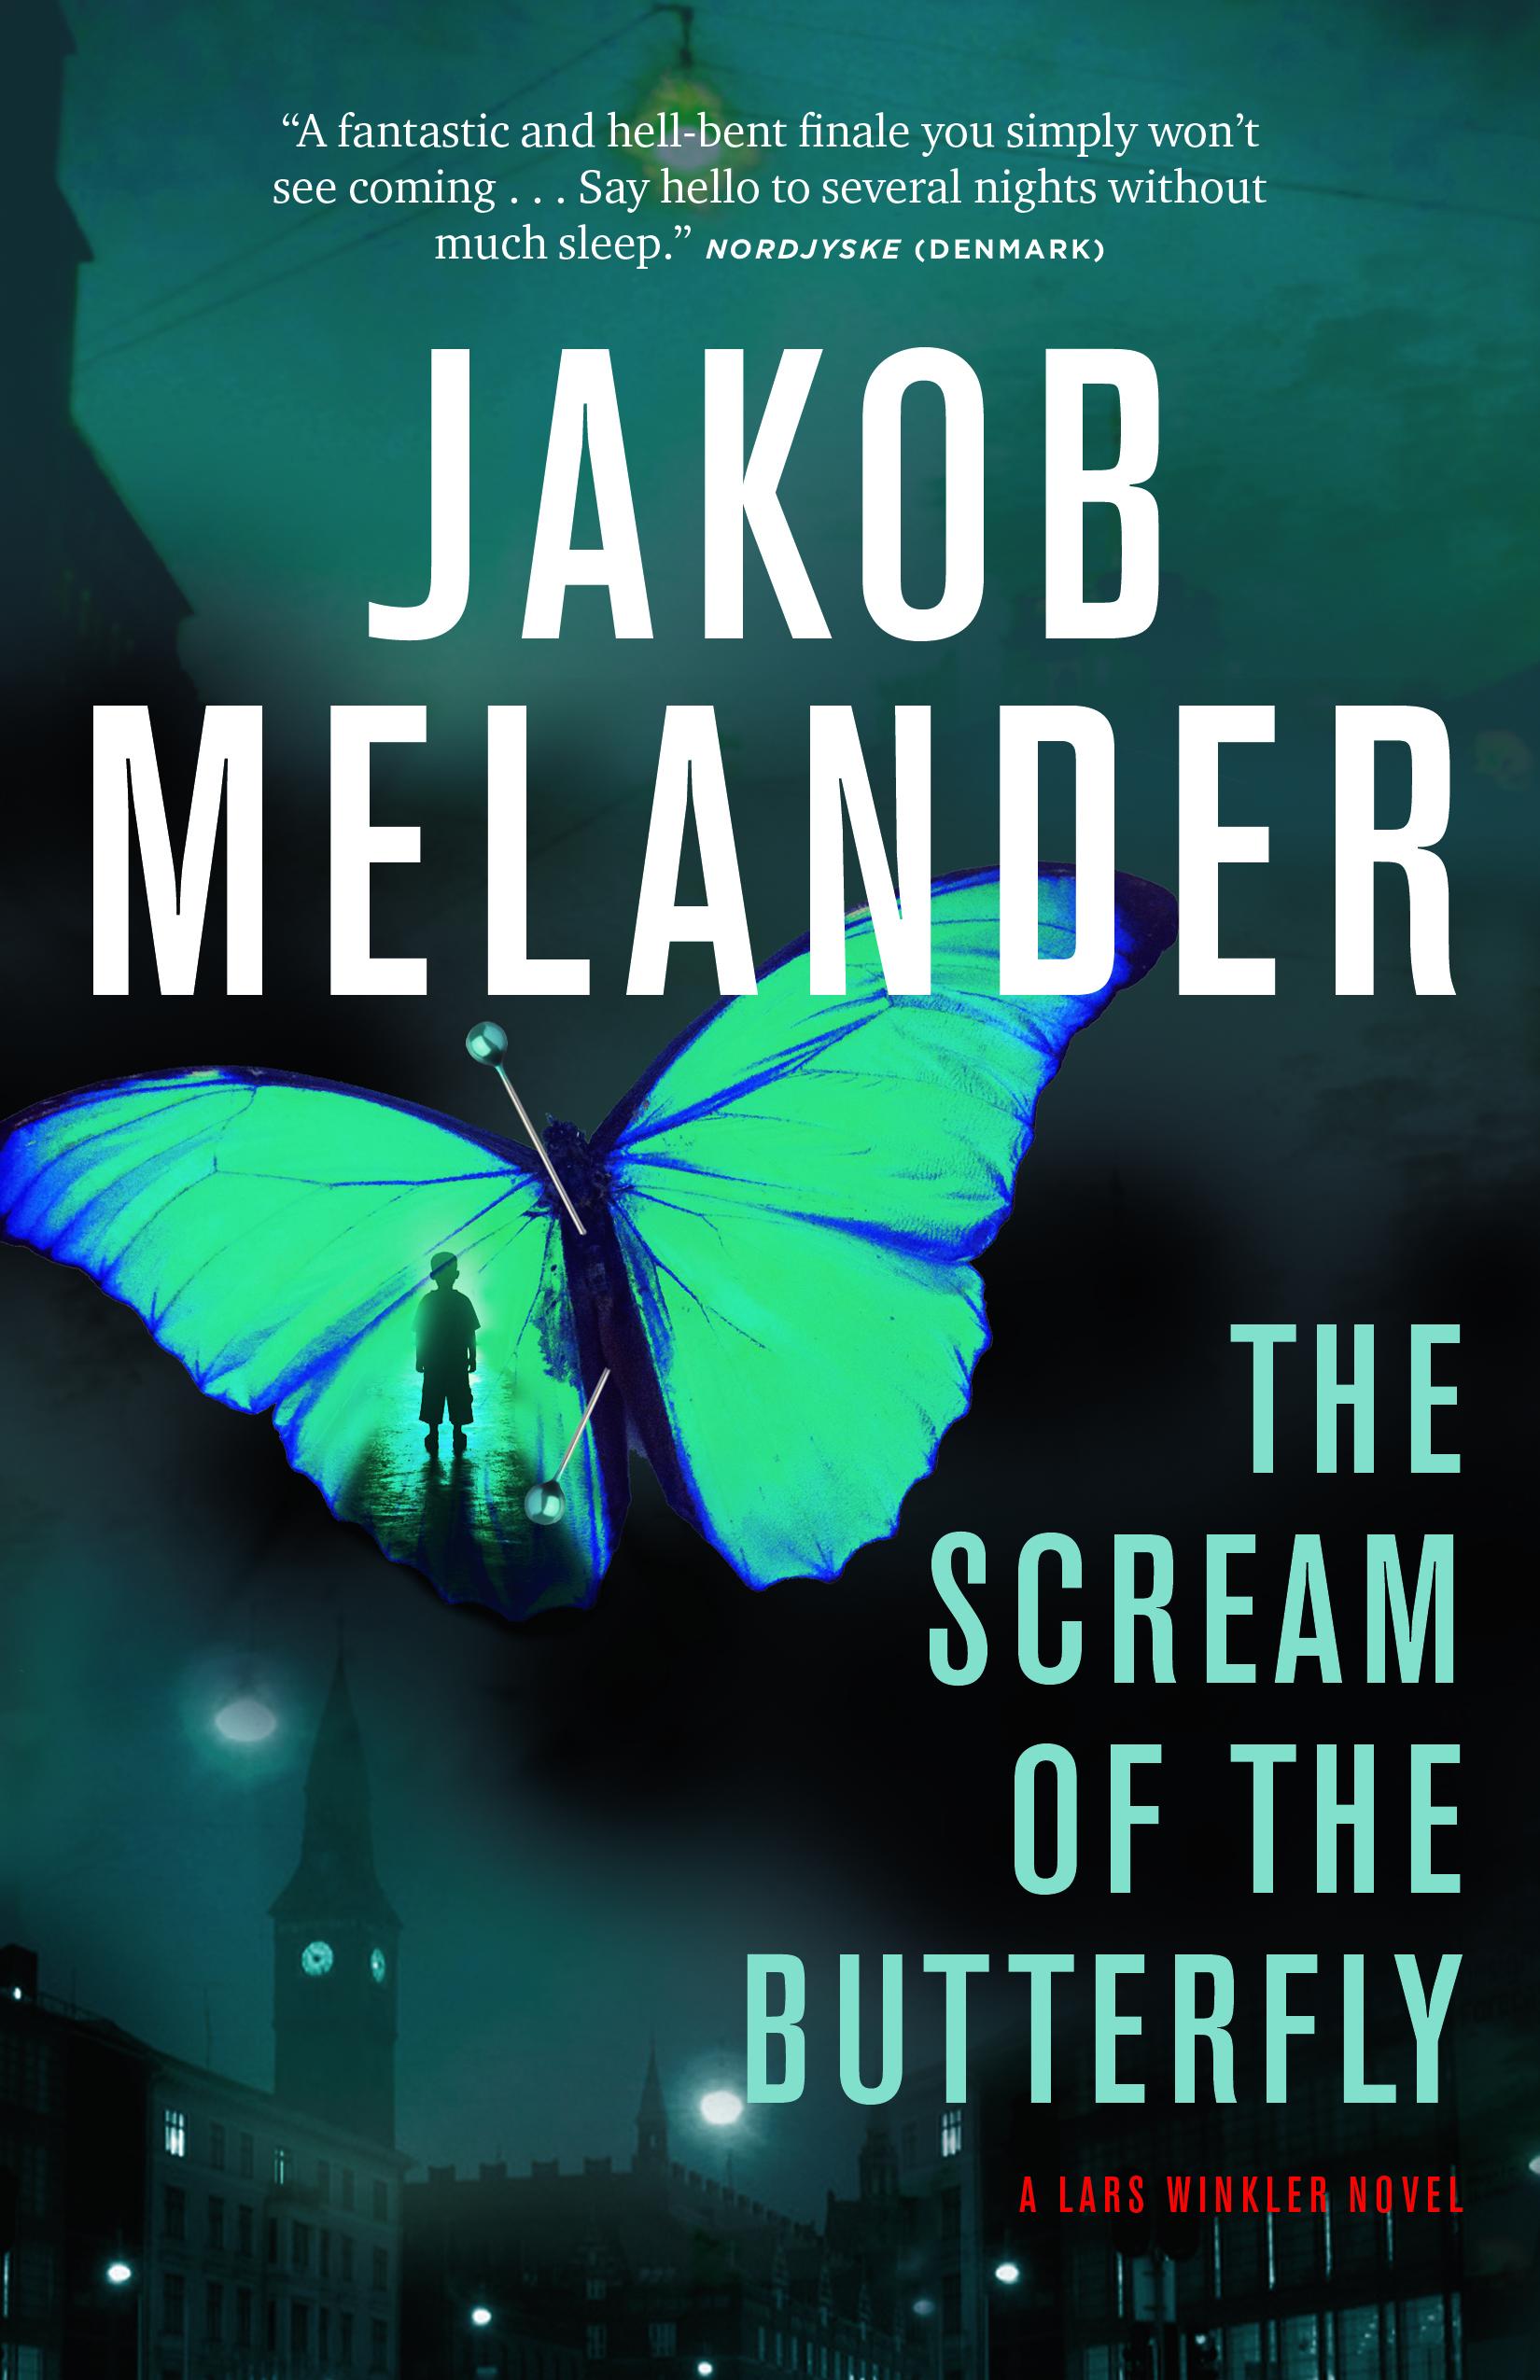 The Scream of the Butterfly by Jakob Melander